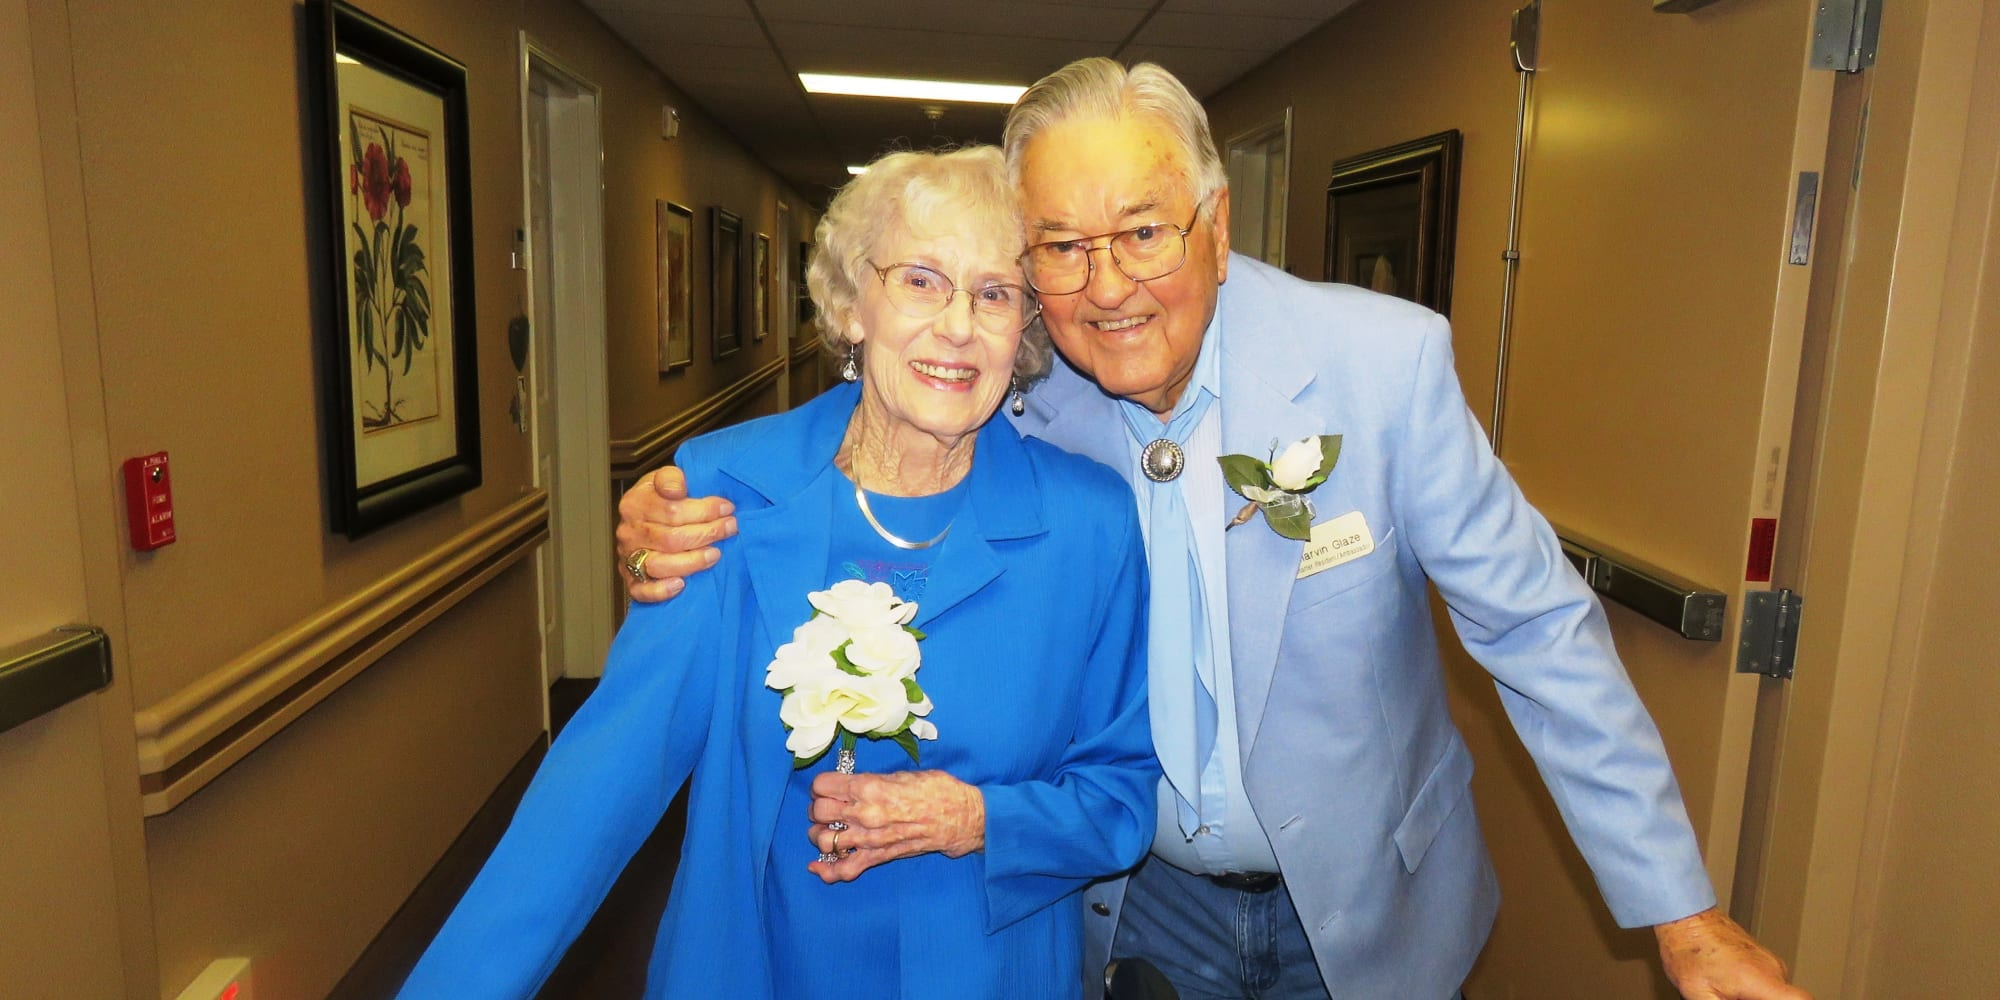 A happy couple at Ivy Creek Gracious Retirement Living in Glen Mills, Pennsylvania